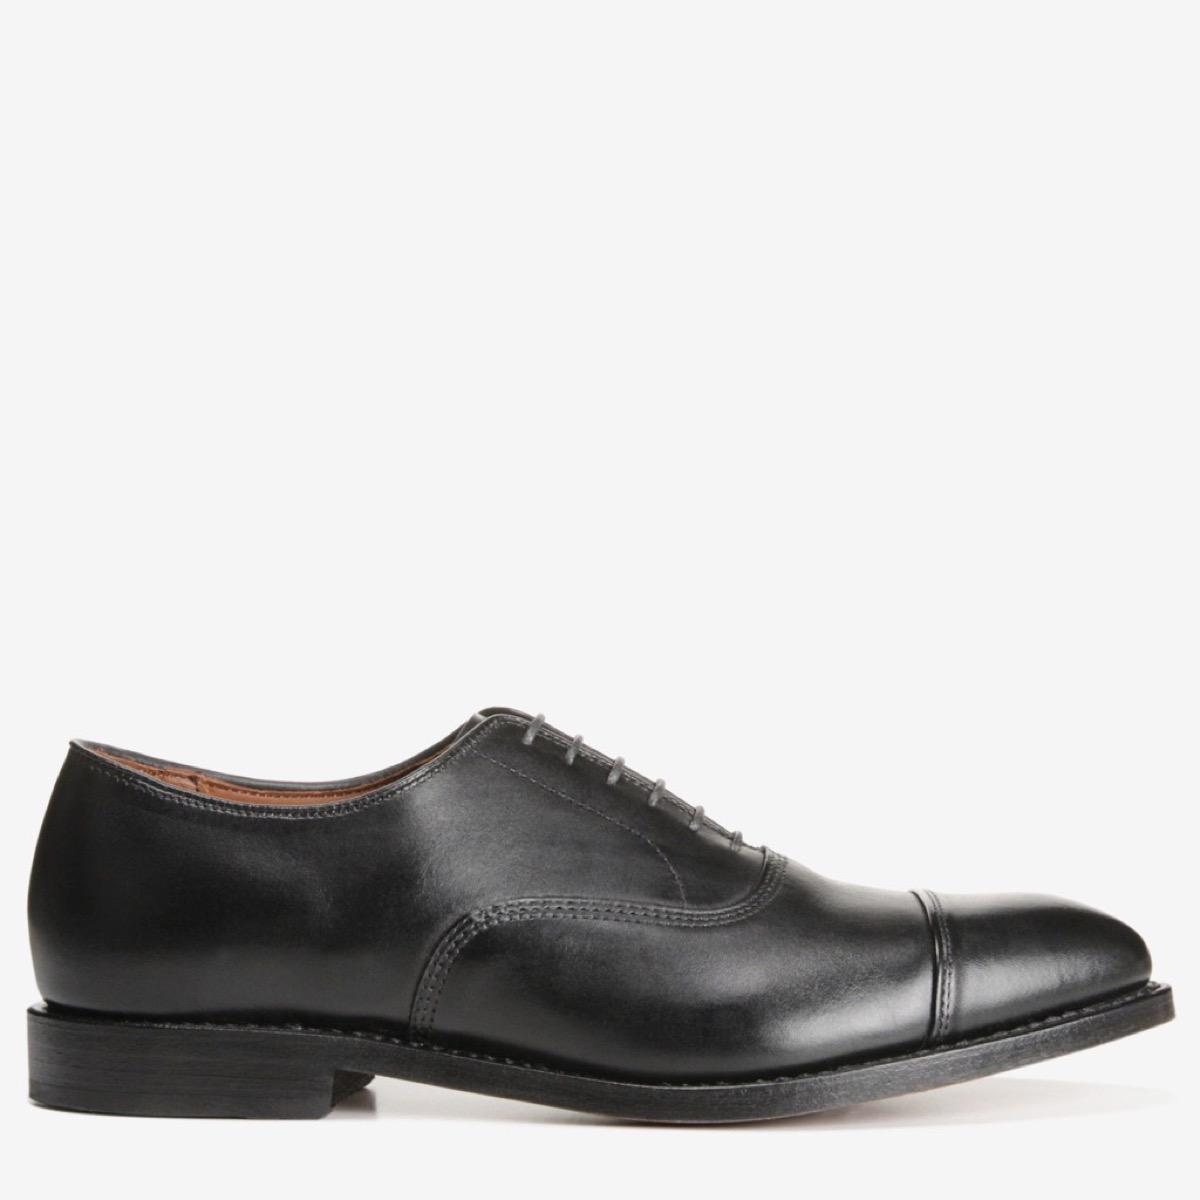 black leather men's shoe from Allen Edmonds